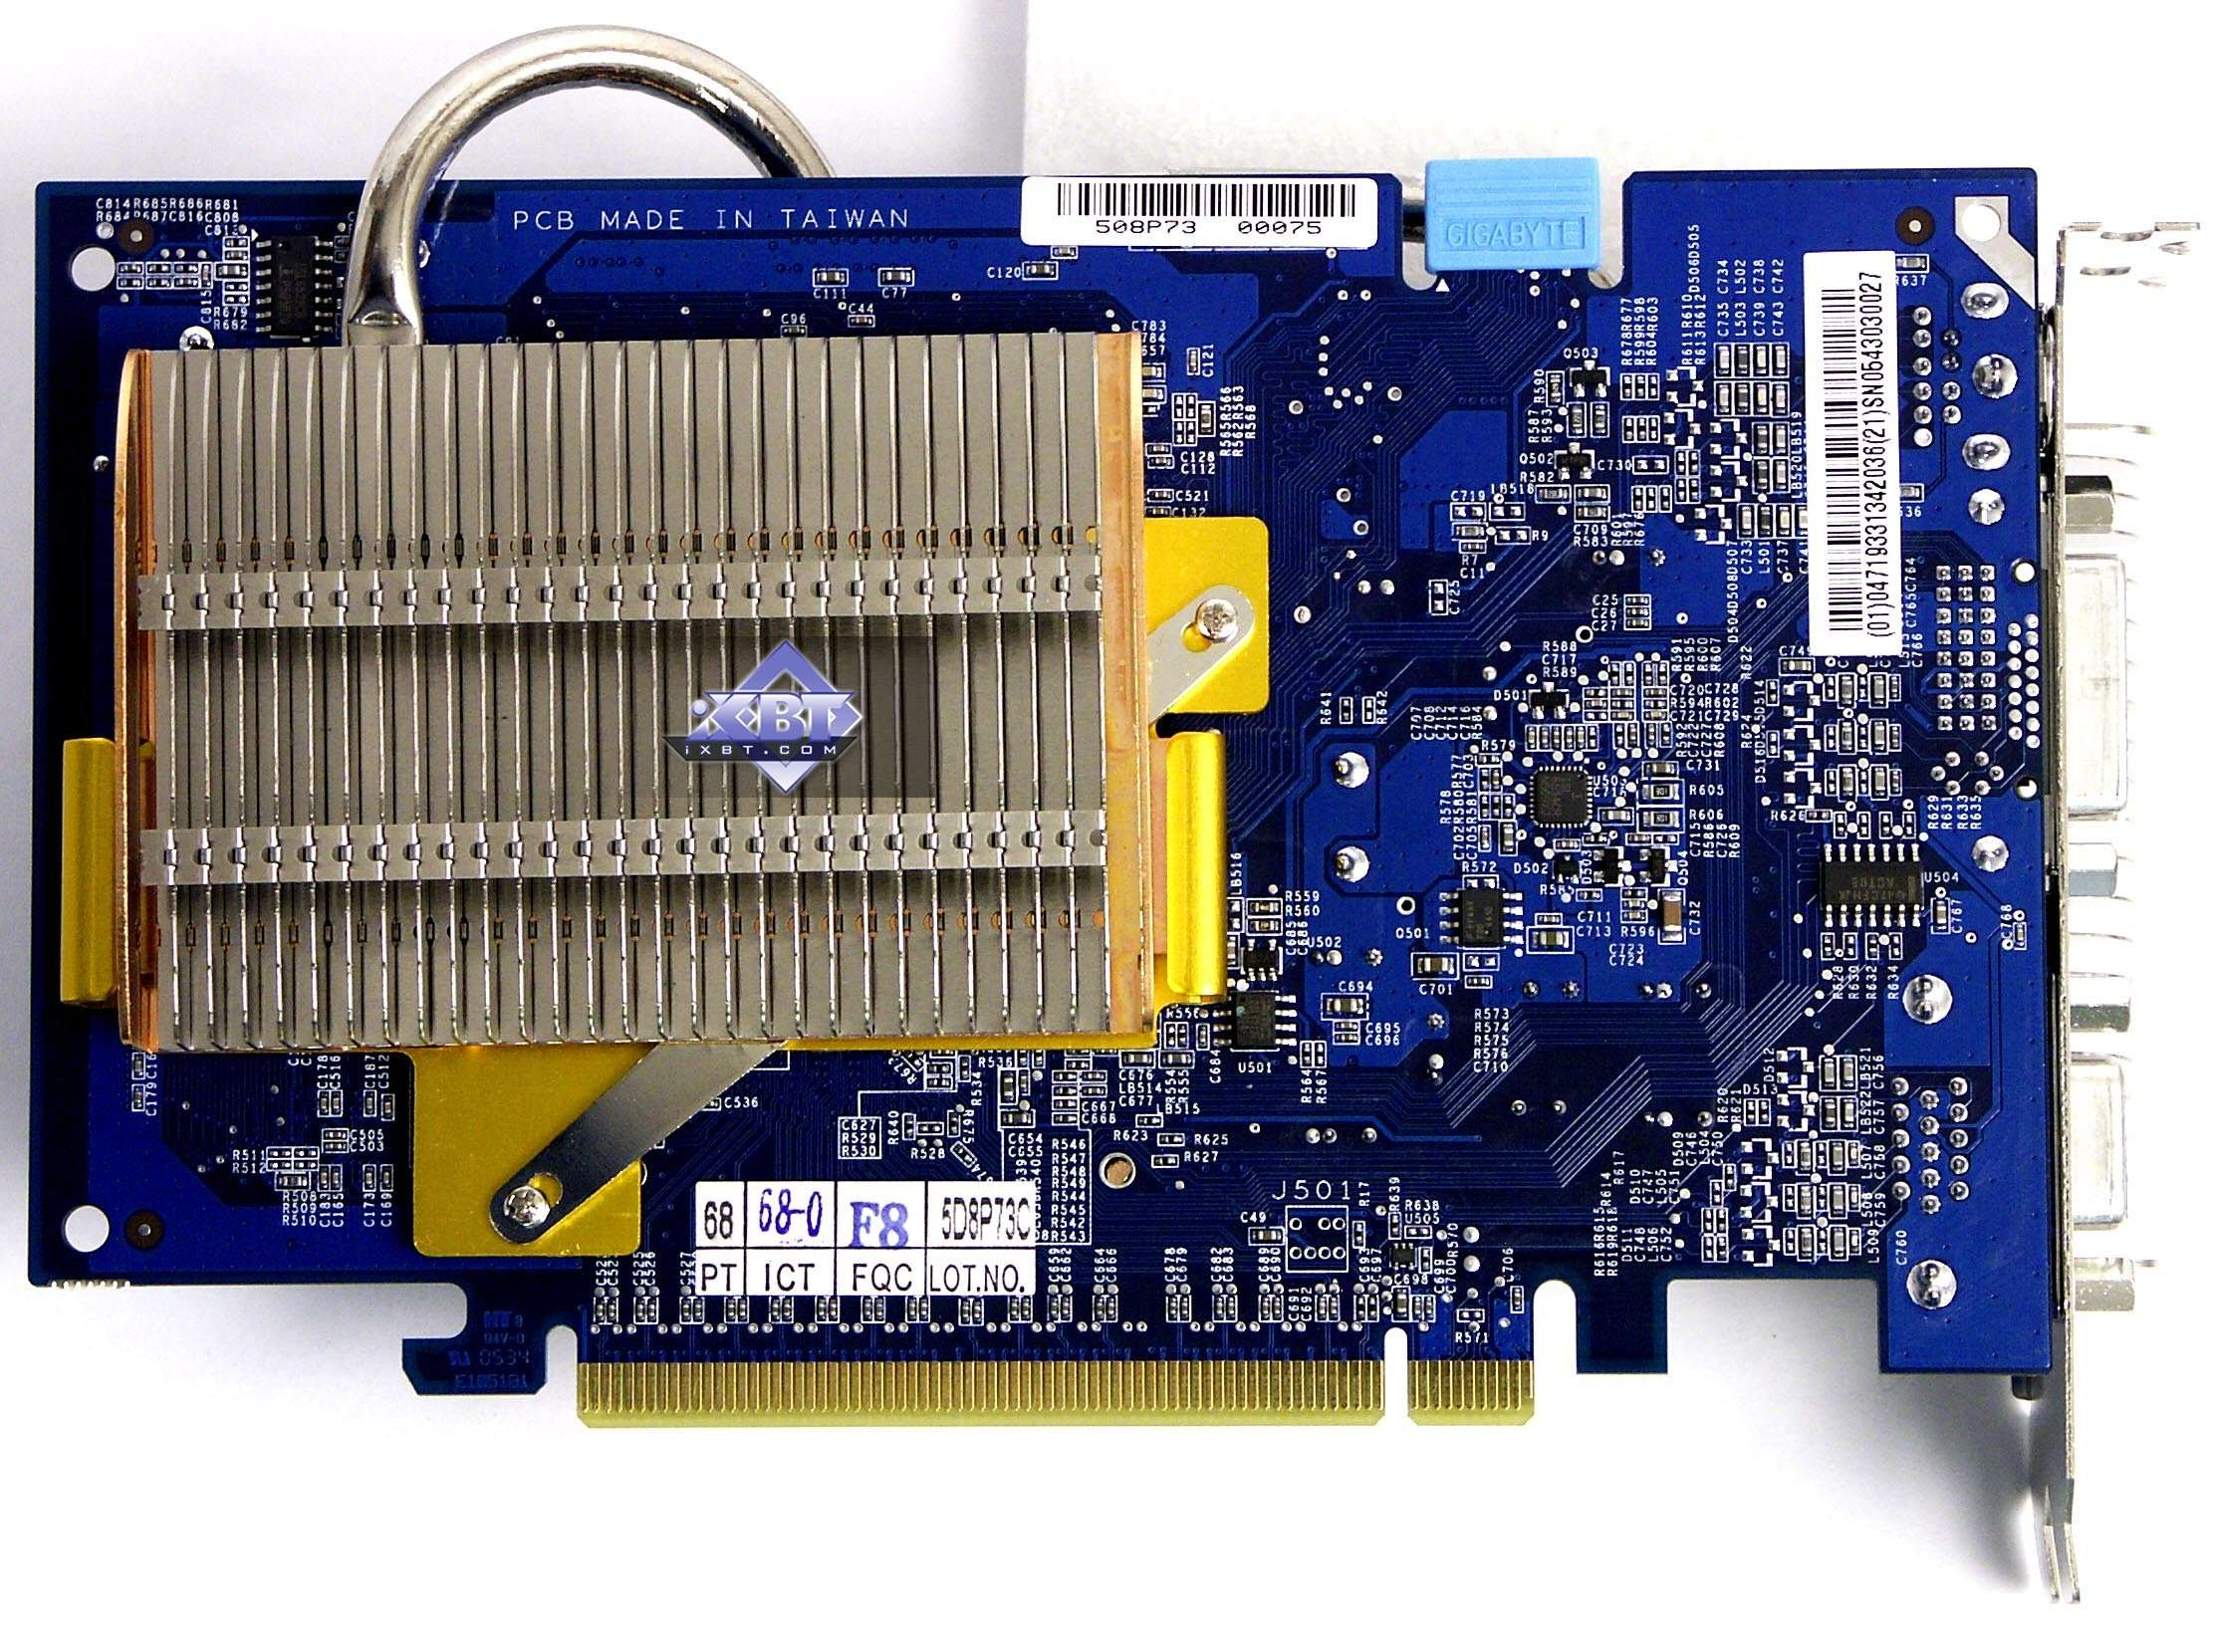 Geforce fx go5200 with latest forceware drivers | skriker.